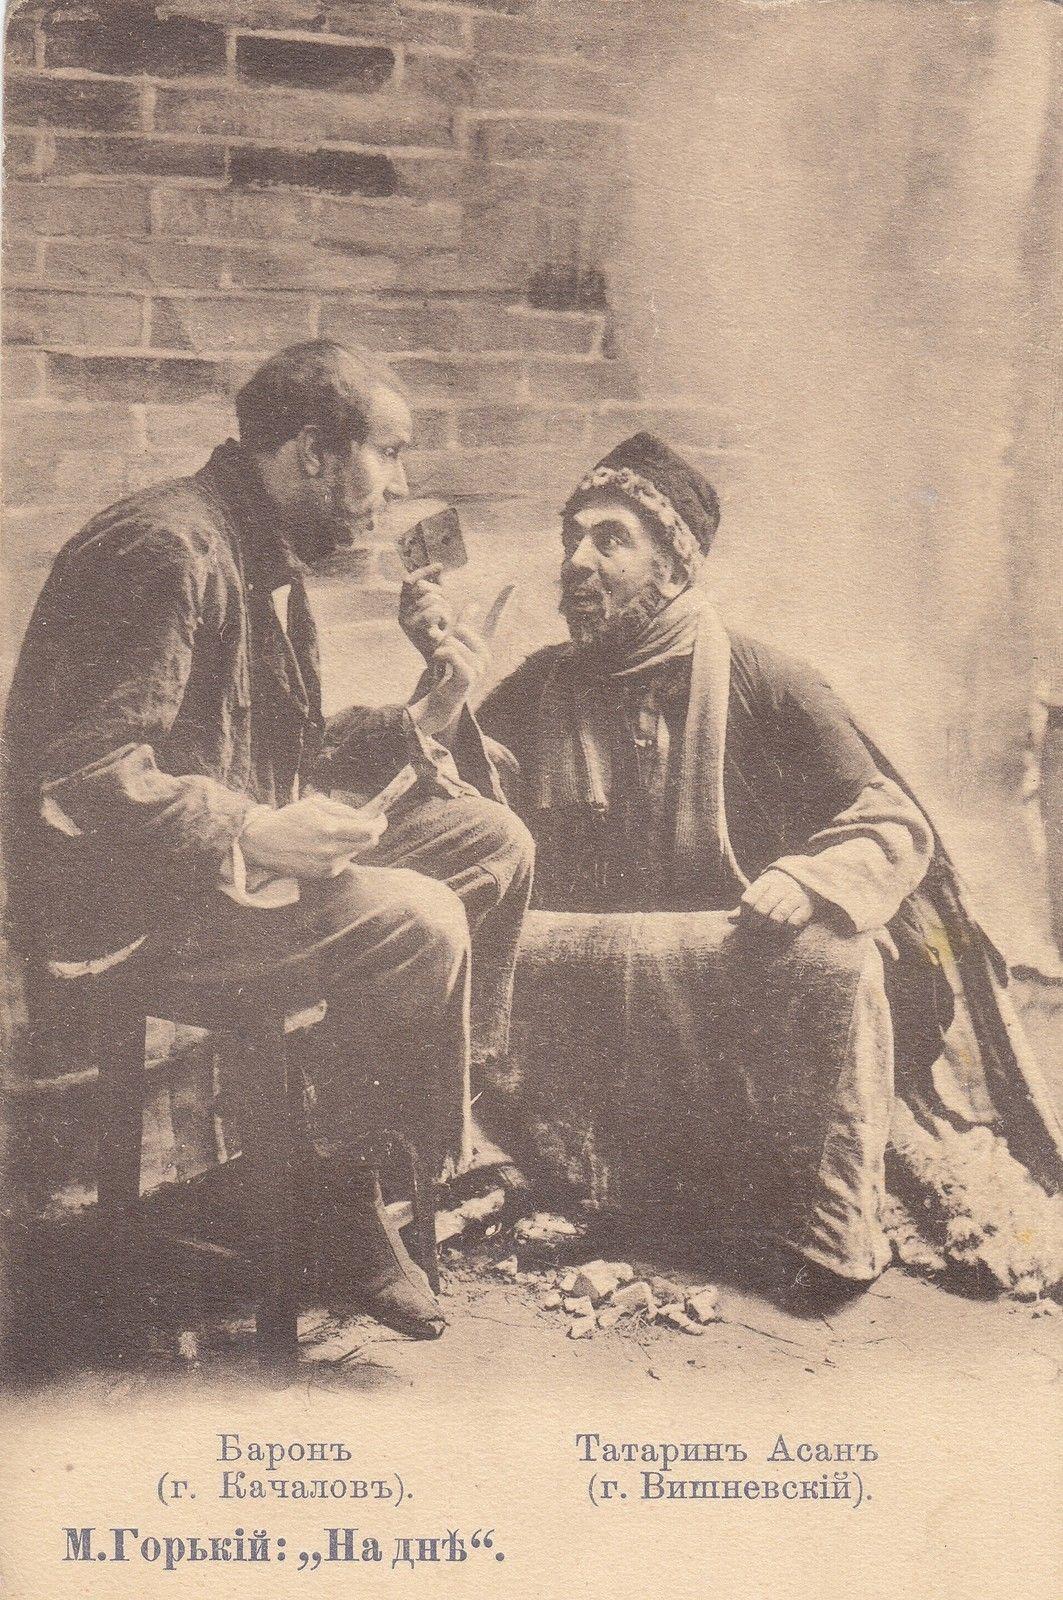 Барон (Качалов), Татарин Асан (Вишневский)